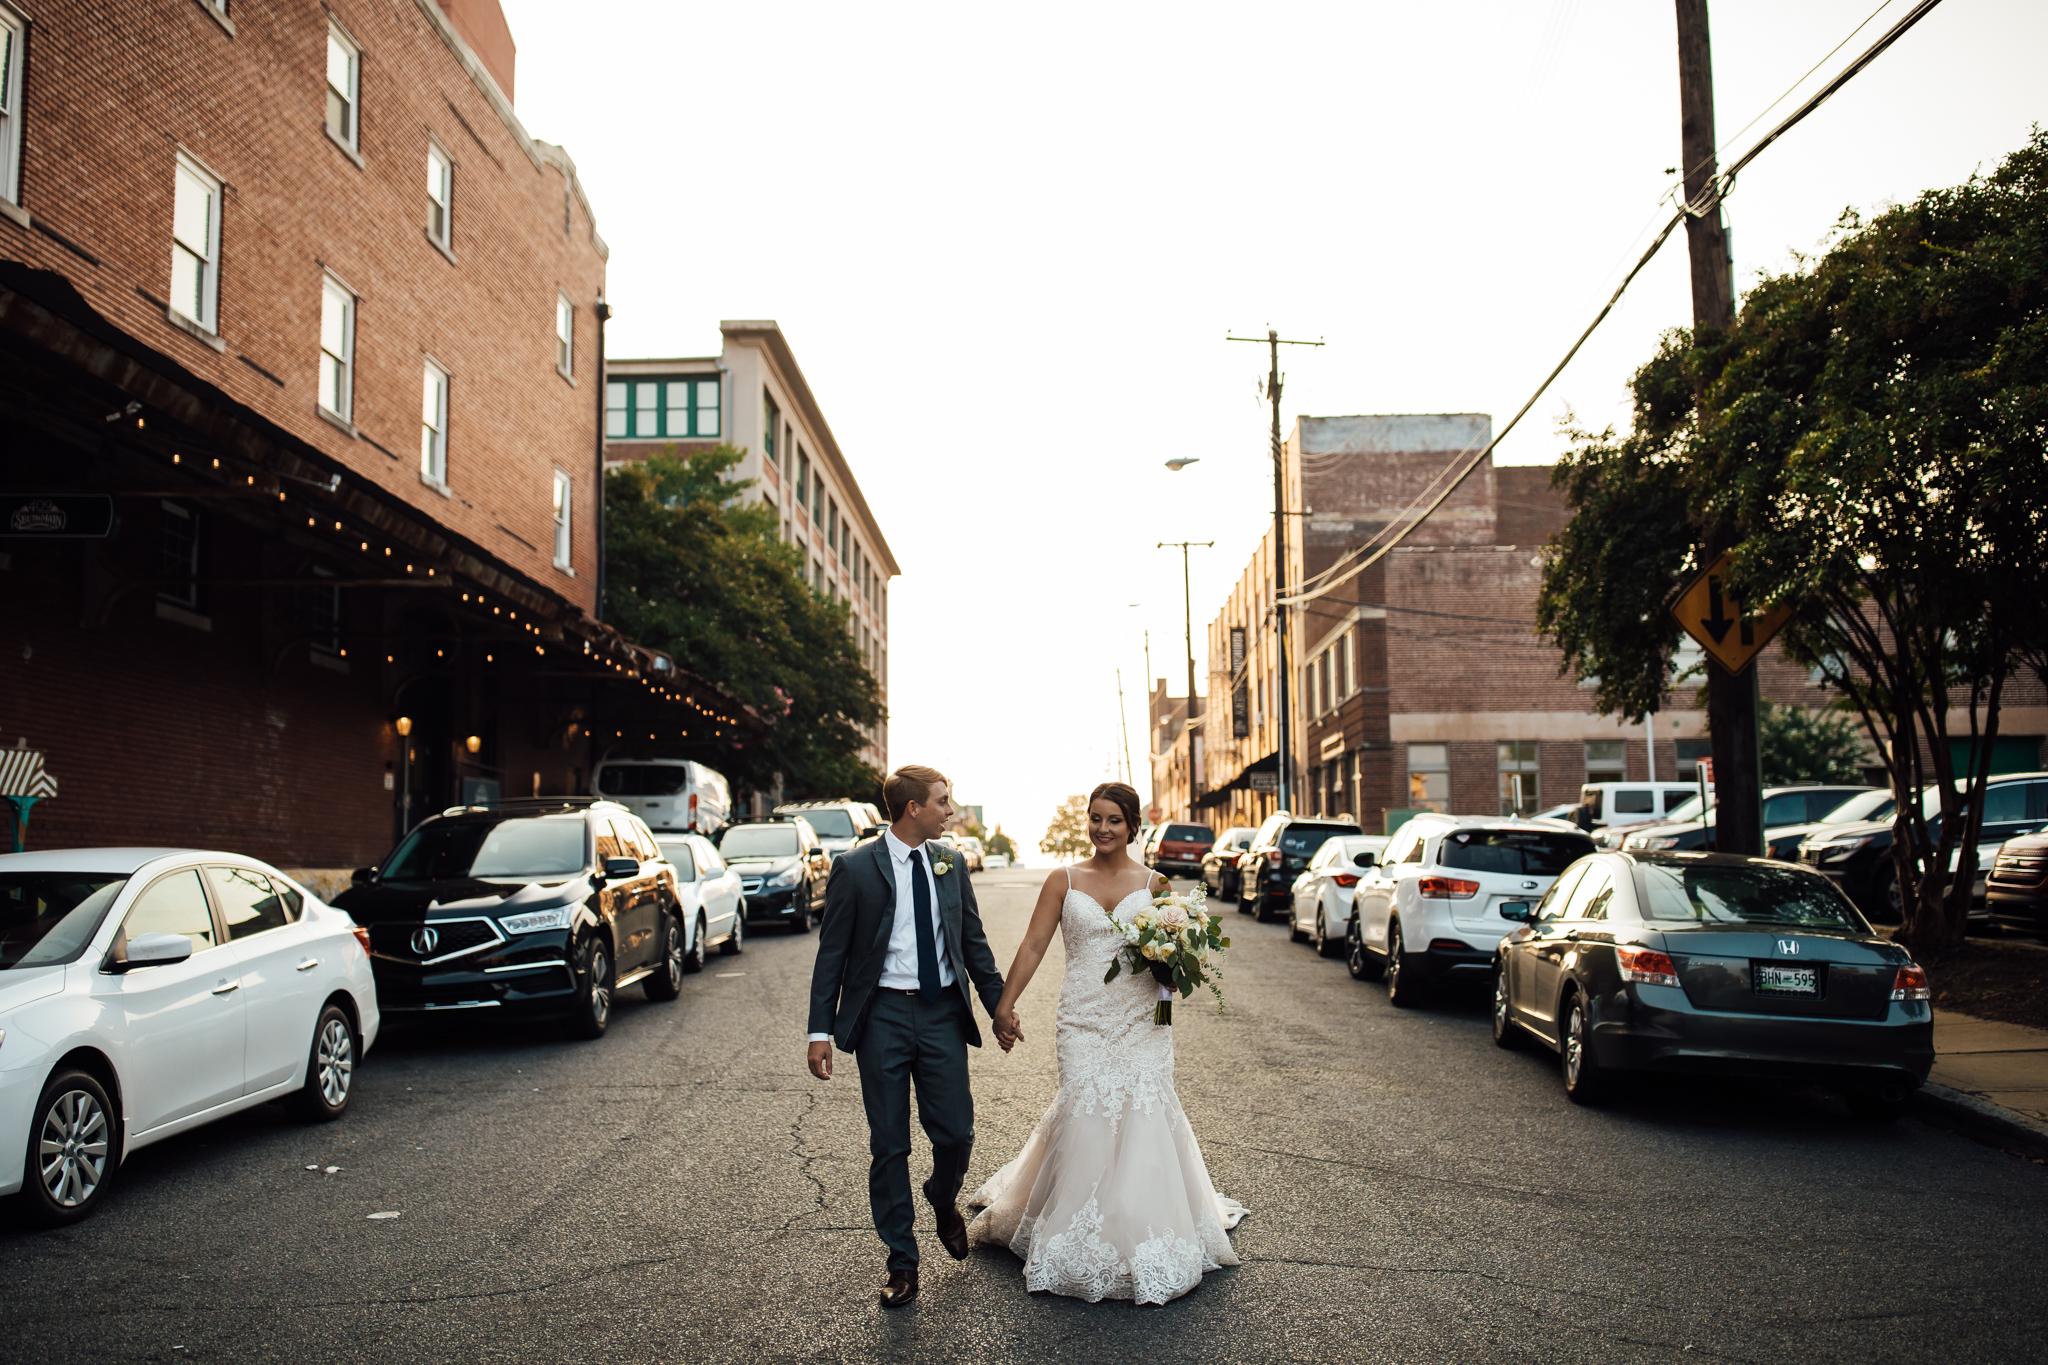 409smain-downtown-memphis-wedding-venue-thewarmtharoundyou (115 of 243).jpg